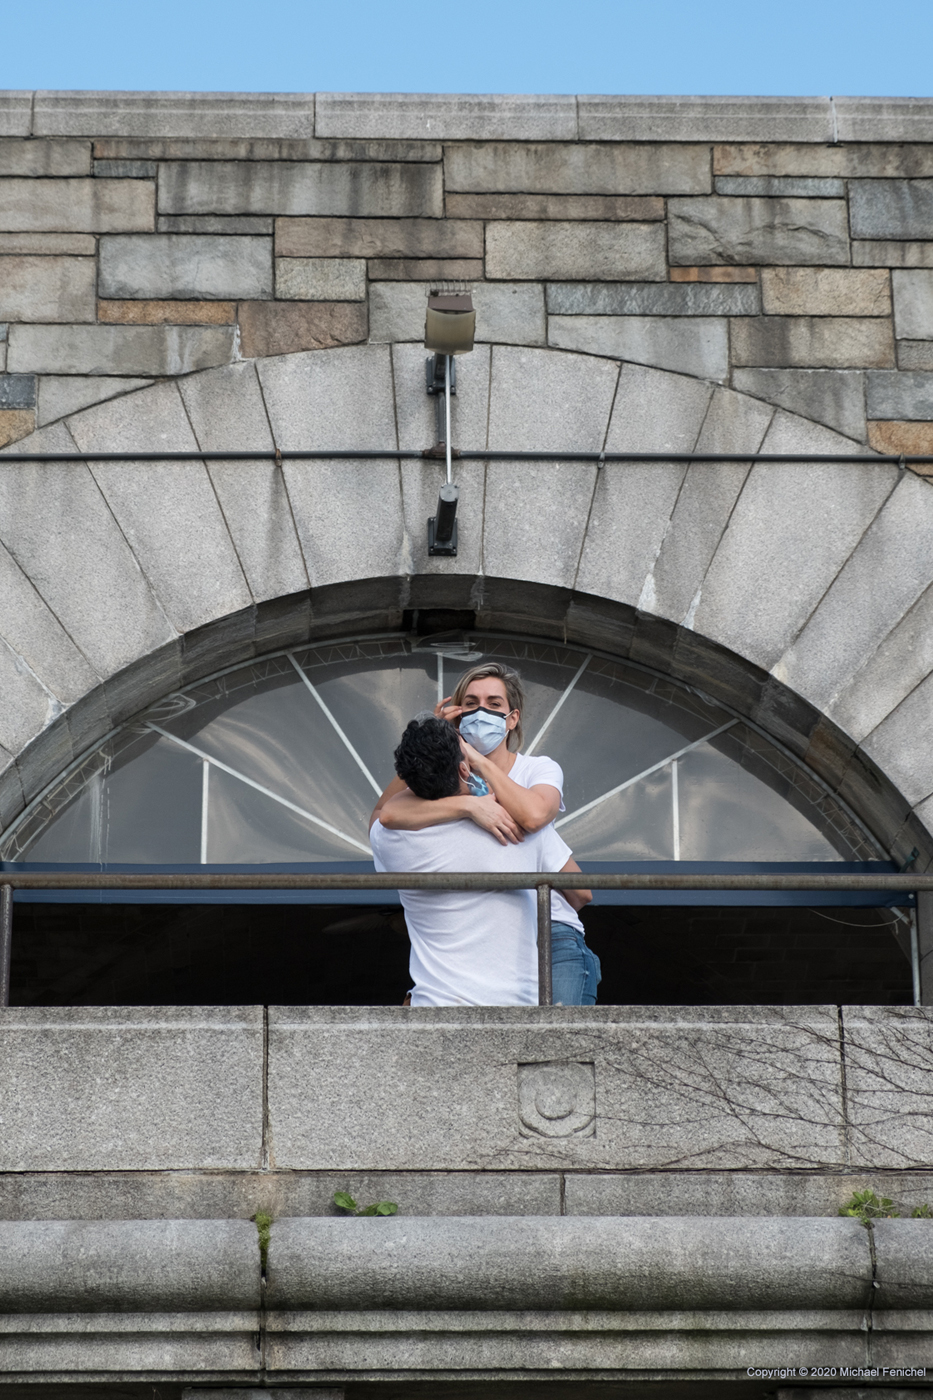 [Masked Couple at 79th St. Rotunda]